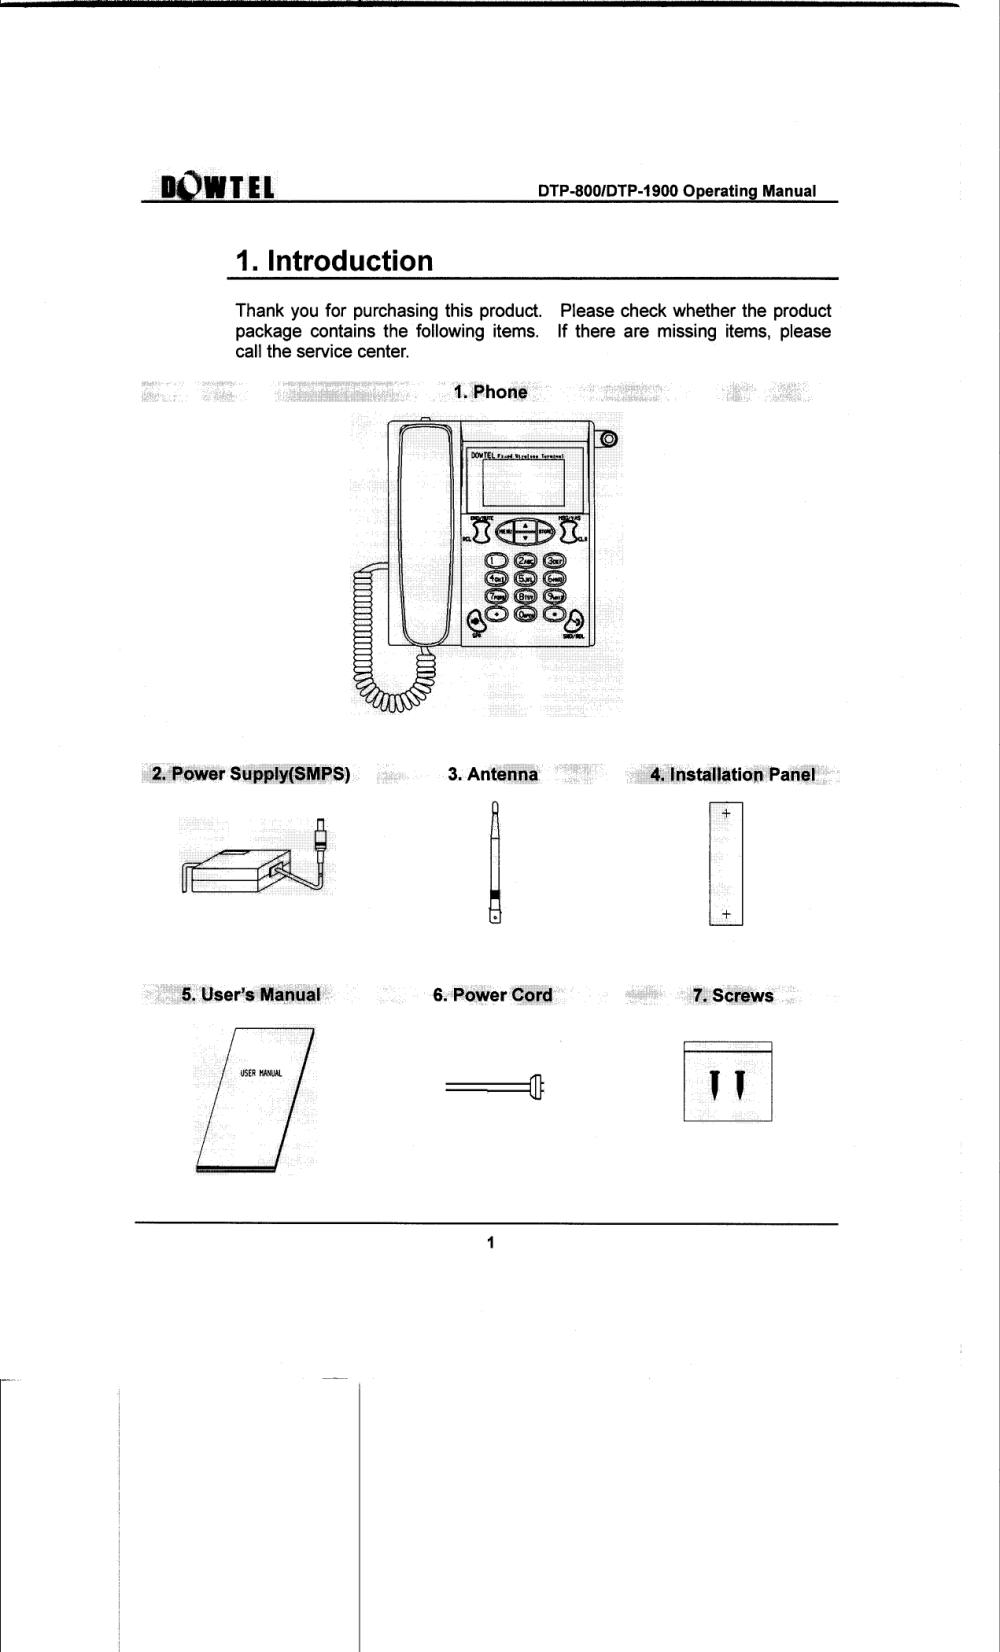 medium resolution of users manual 1 of 3